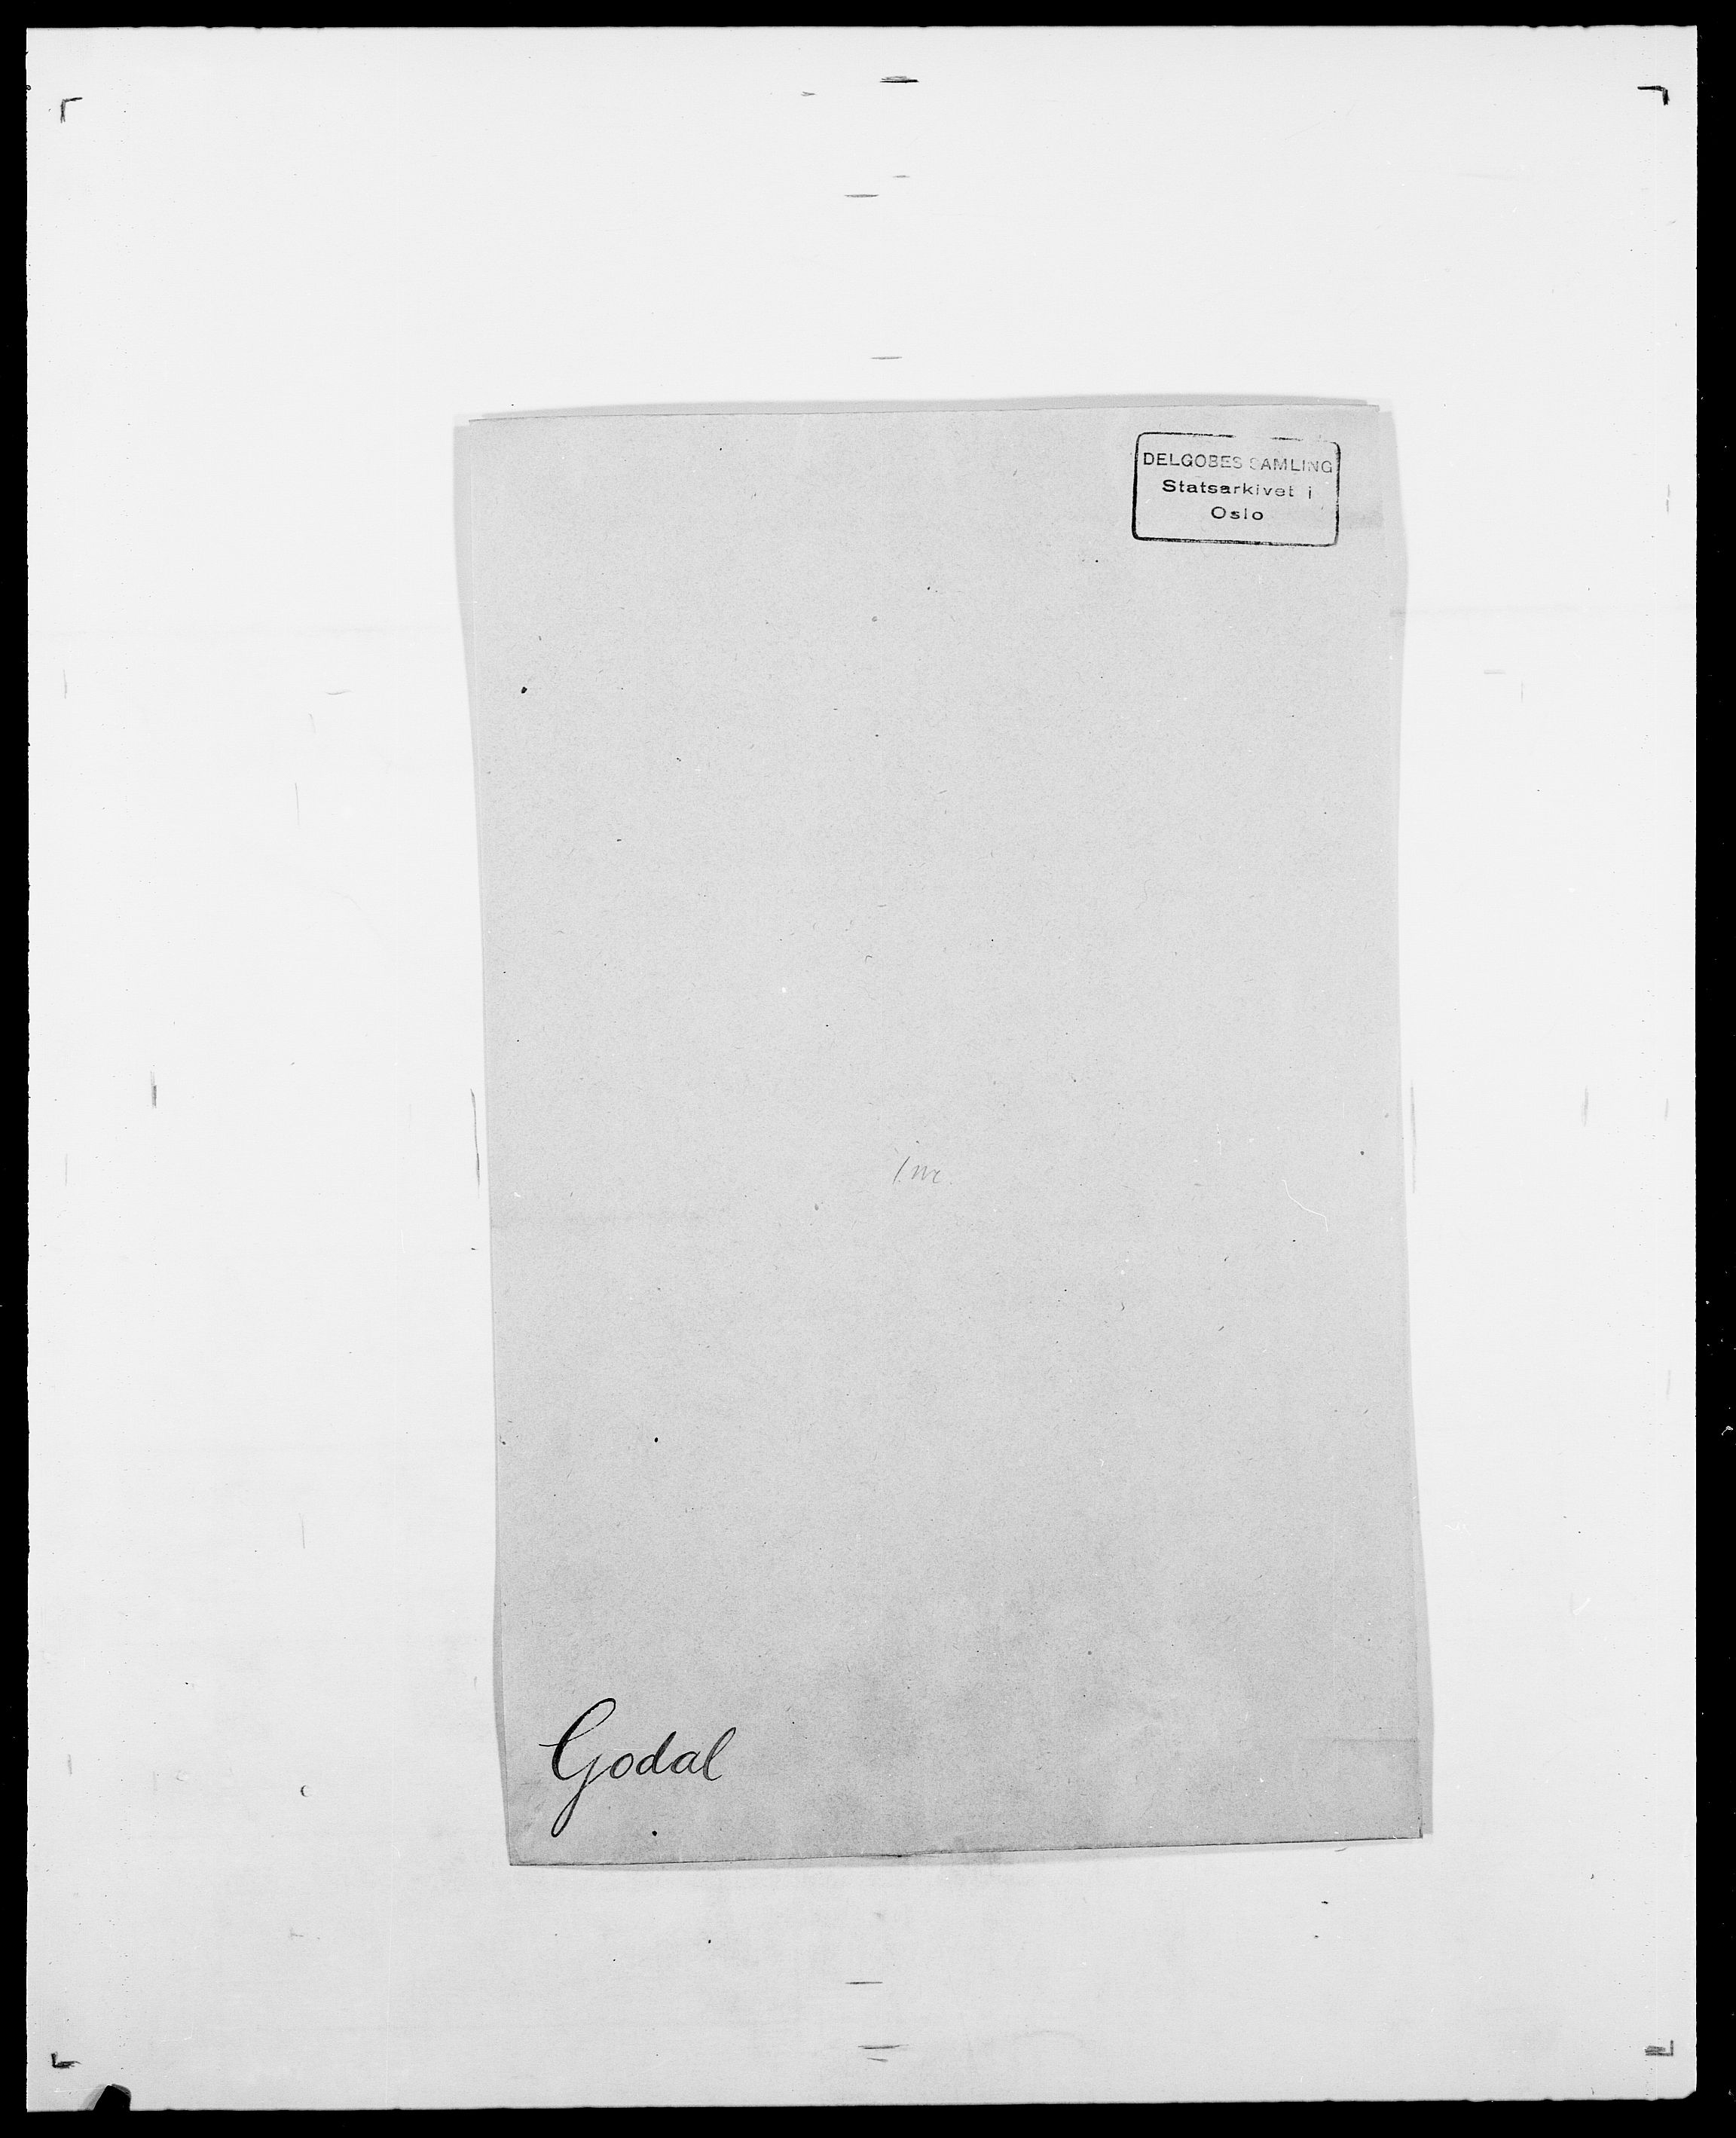 SAO, Delgobe, Charles Antoine - samling, D/Da/L0014: Giebdhausen - Grip, s. 358